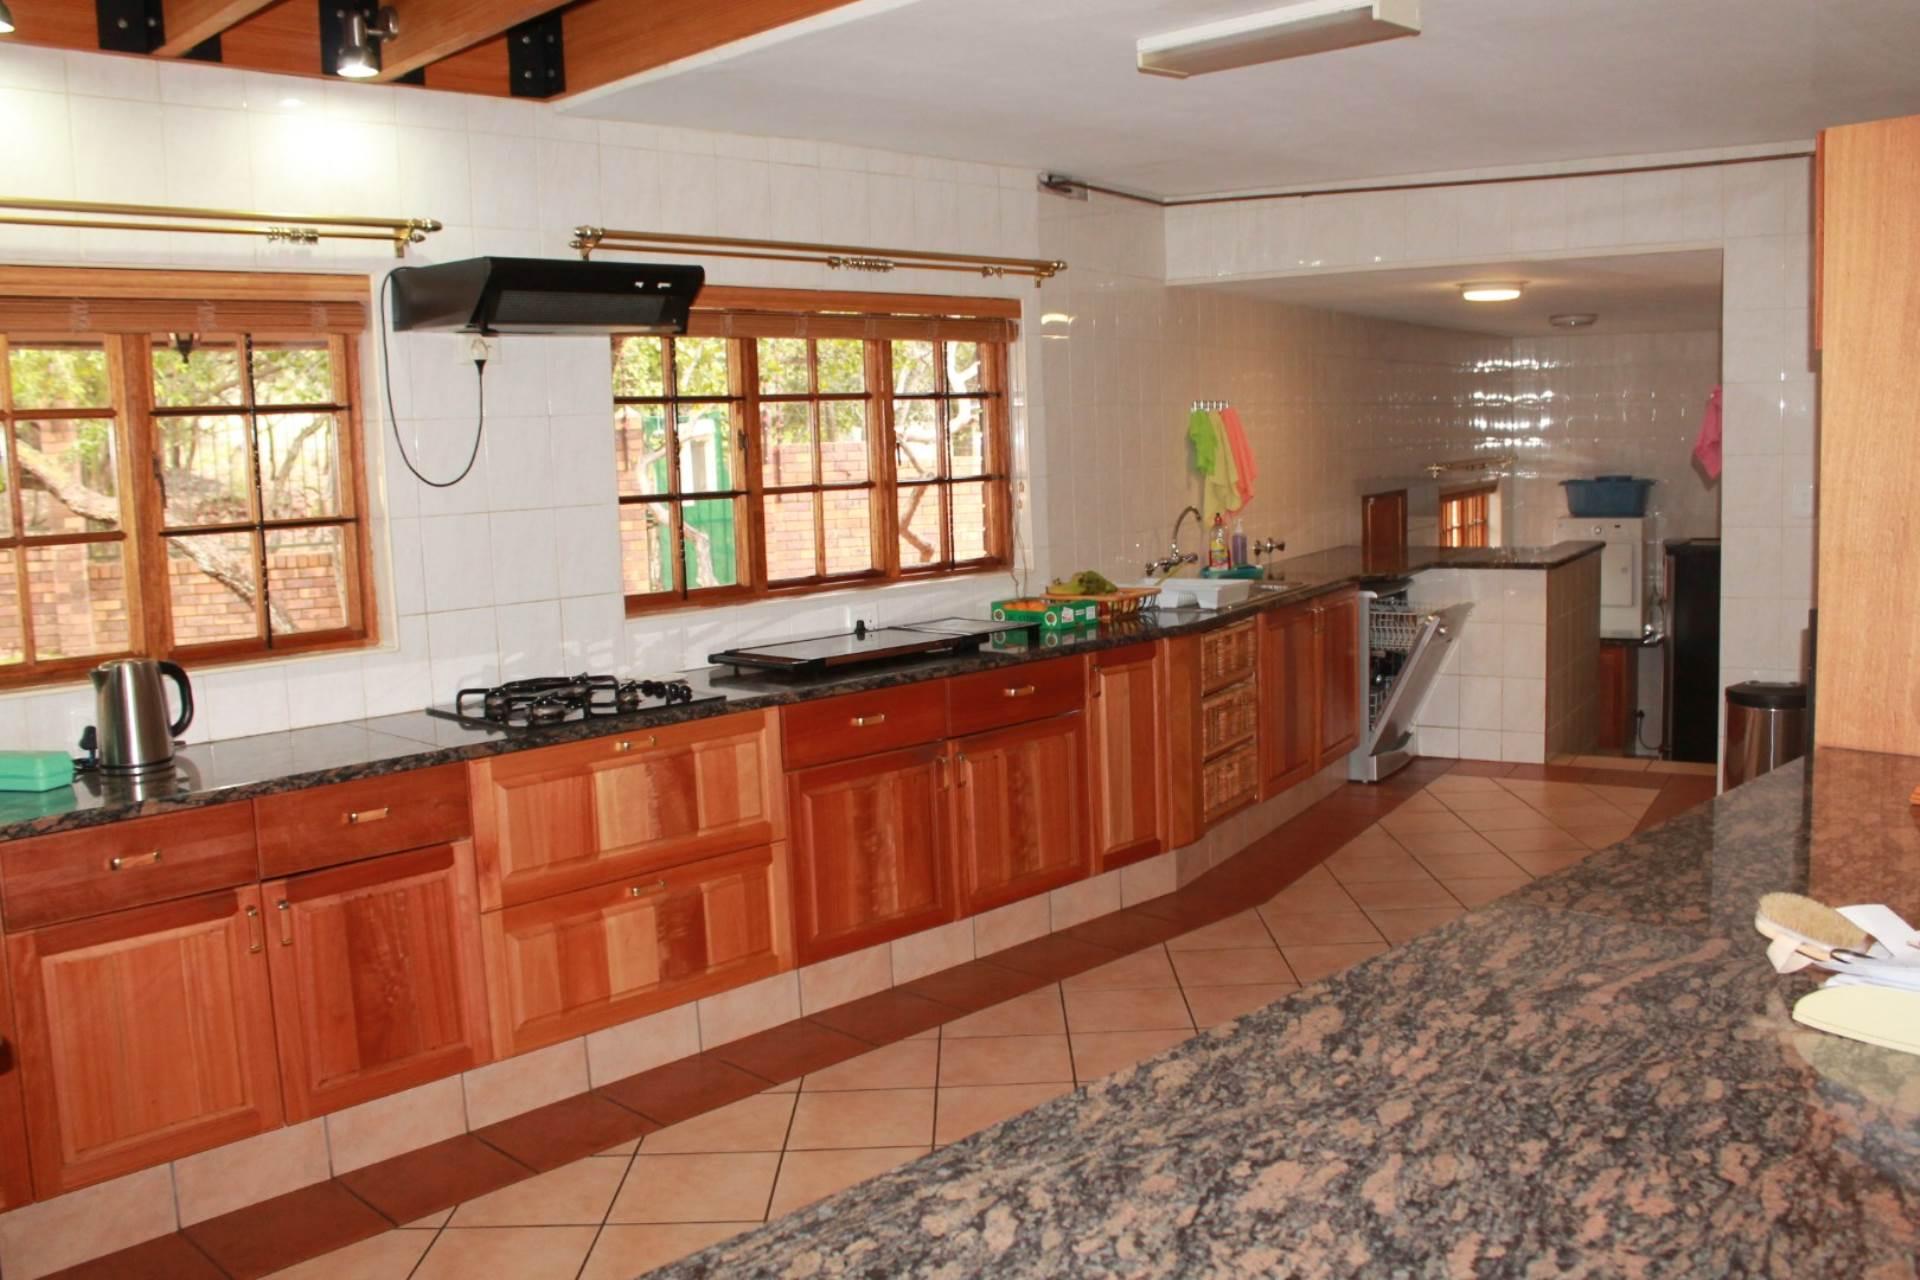 Akasia, Ninapark Property  | Houses For Sale Ninapark, NINAPARK, House 3 bedrooms property for sale Price:1,780,000